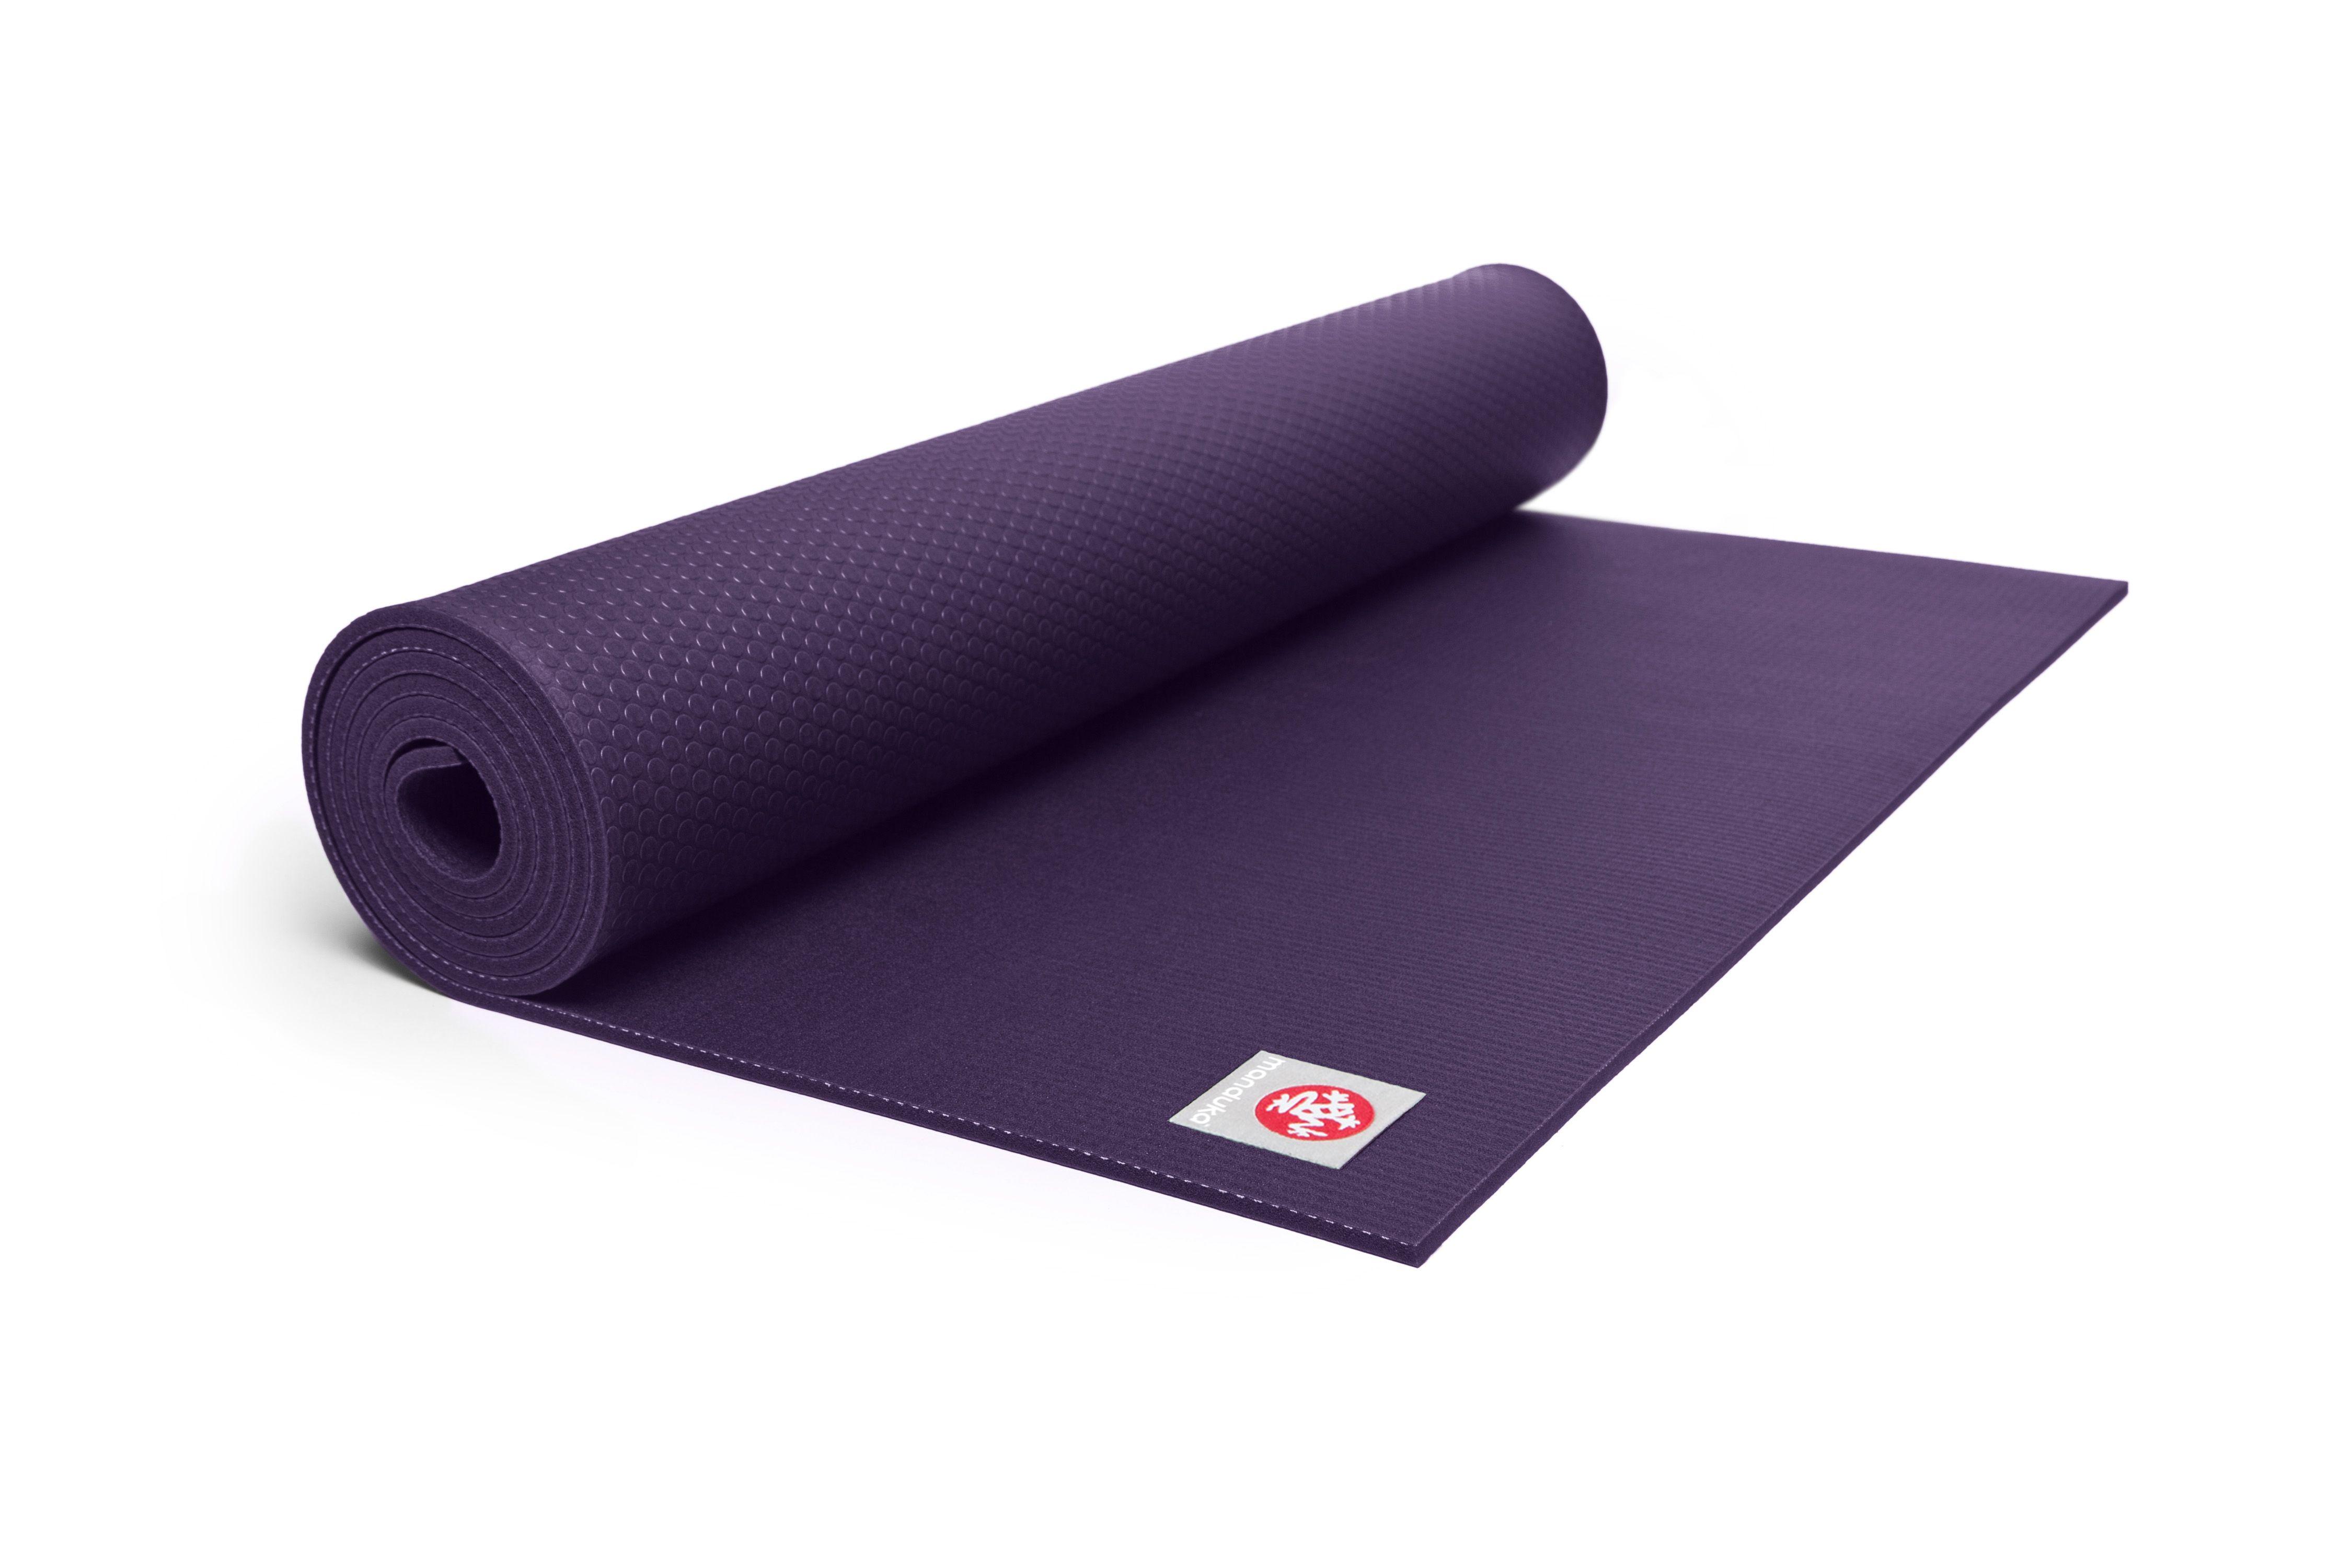 Manduka Pro Black Magic Thick 85 Yoga Mat Limited Edition Purple Leslea Wants This For Christmas Manduka Yoga Yoga Mat Reviews Manduka Yoga Mat